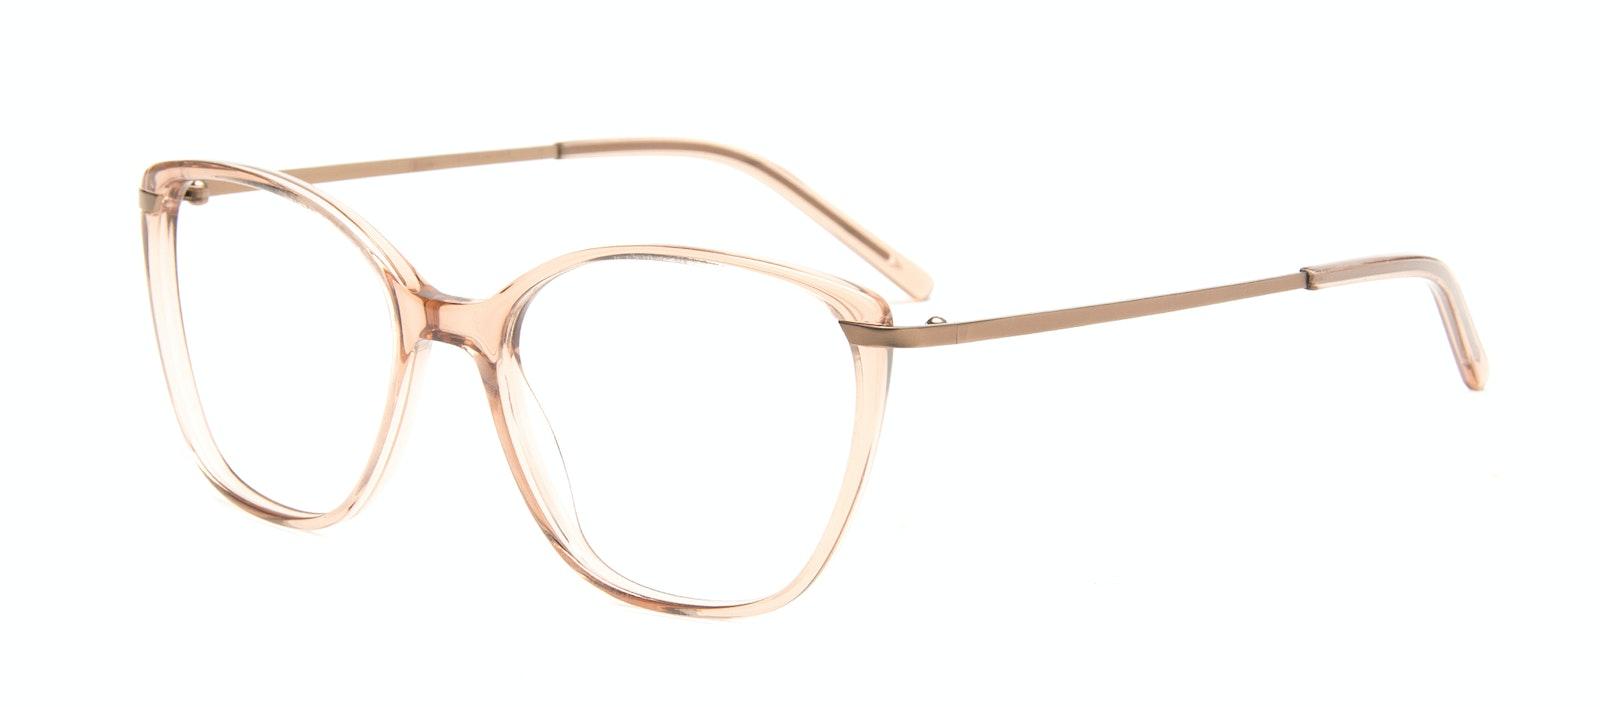 Affordable Fashion Glasses Cat Eye Rectangle Square Eyeglasses Women Illusion Rose Tilt